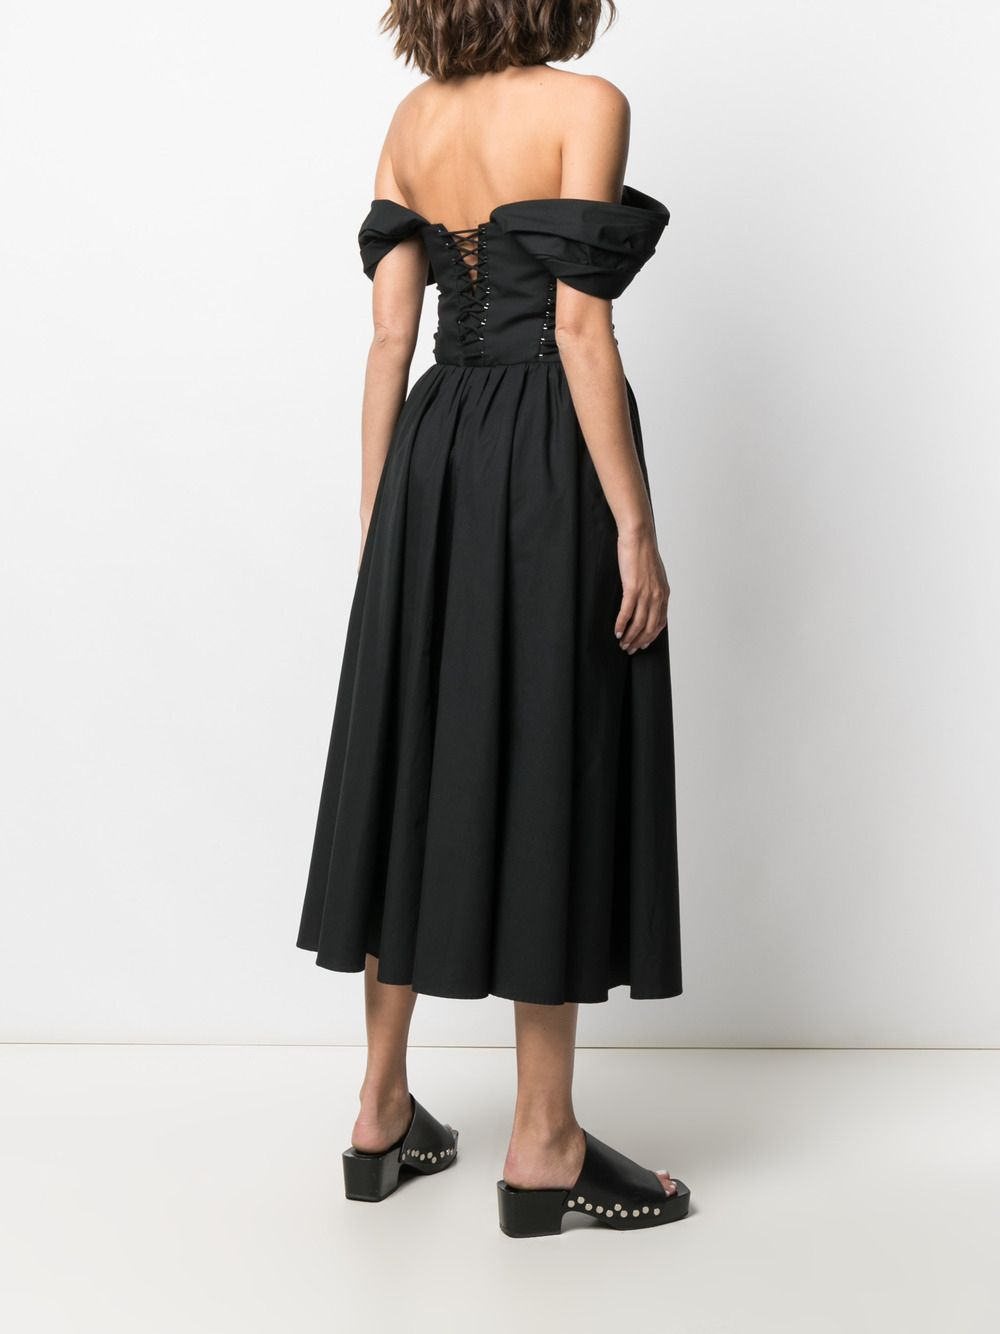 PHILOSOPHY di LORENZO SERAFINI | Dress | A041221190555